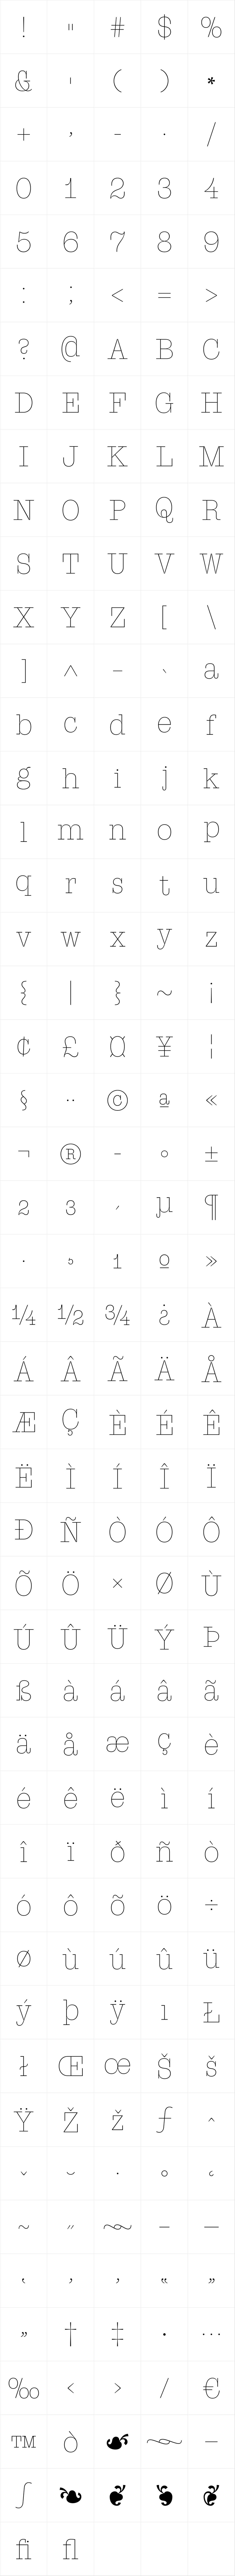 Suomi Slab Serif Thin